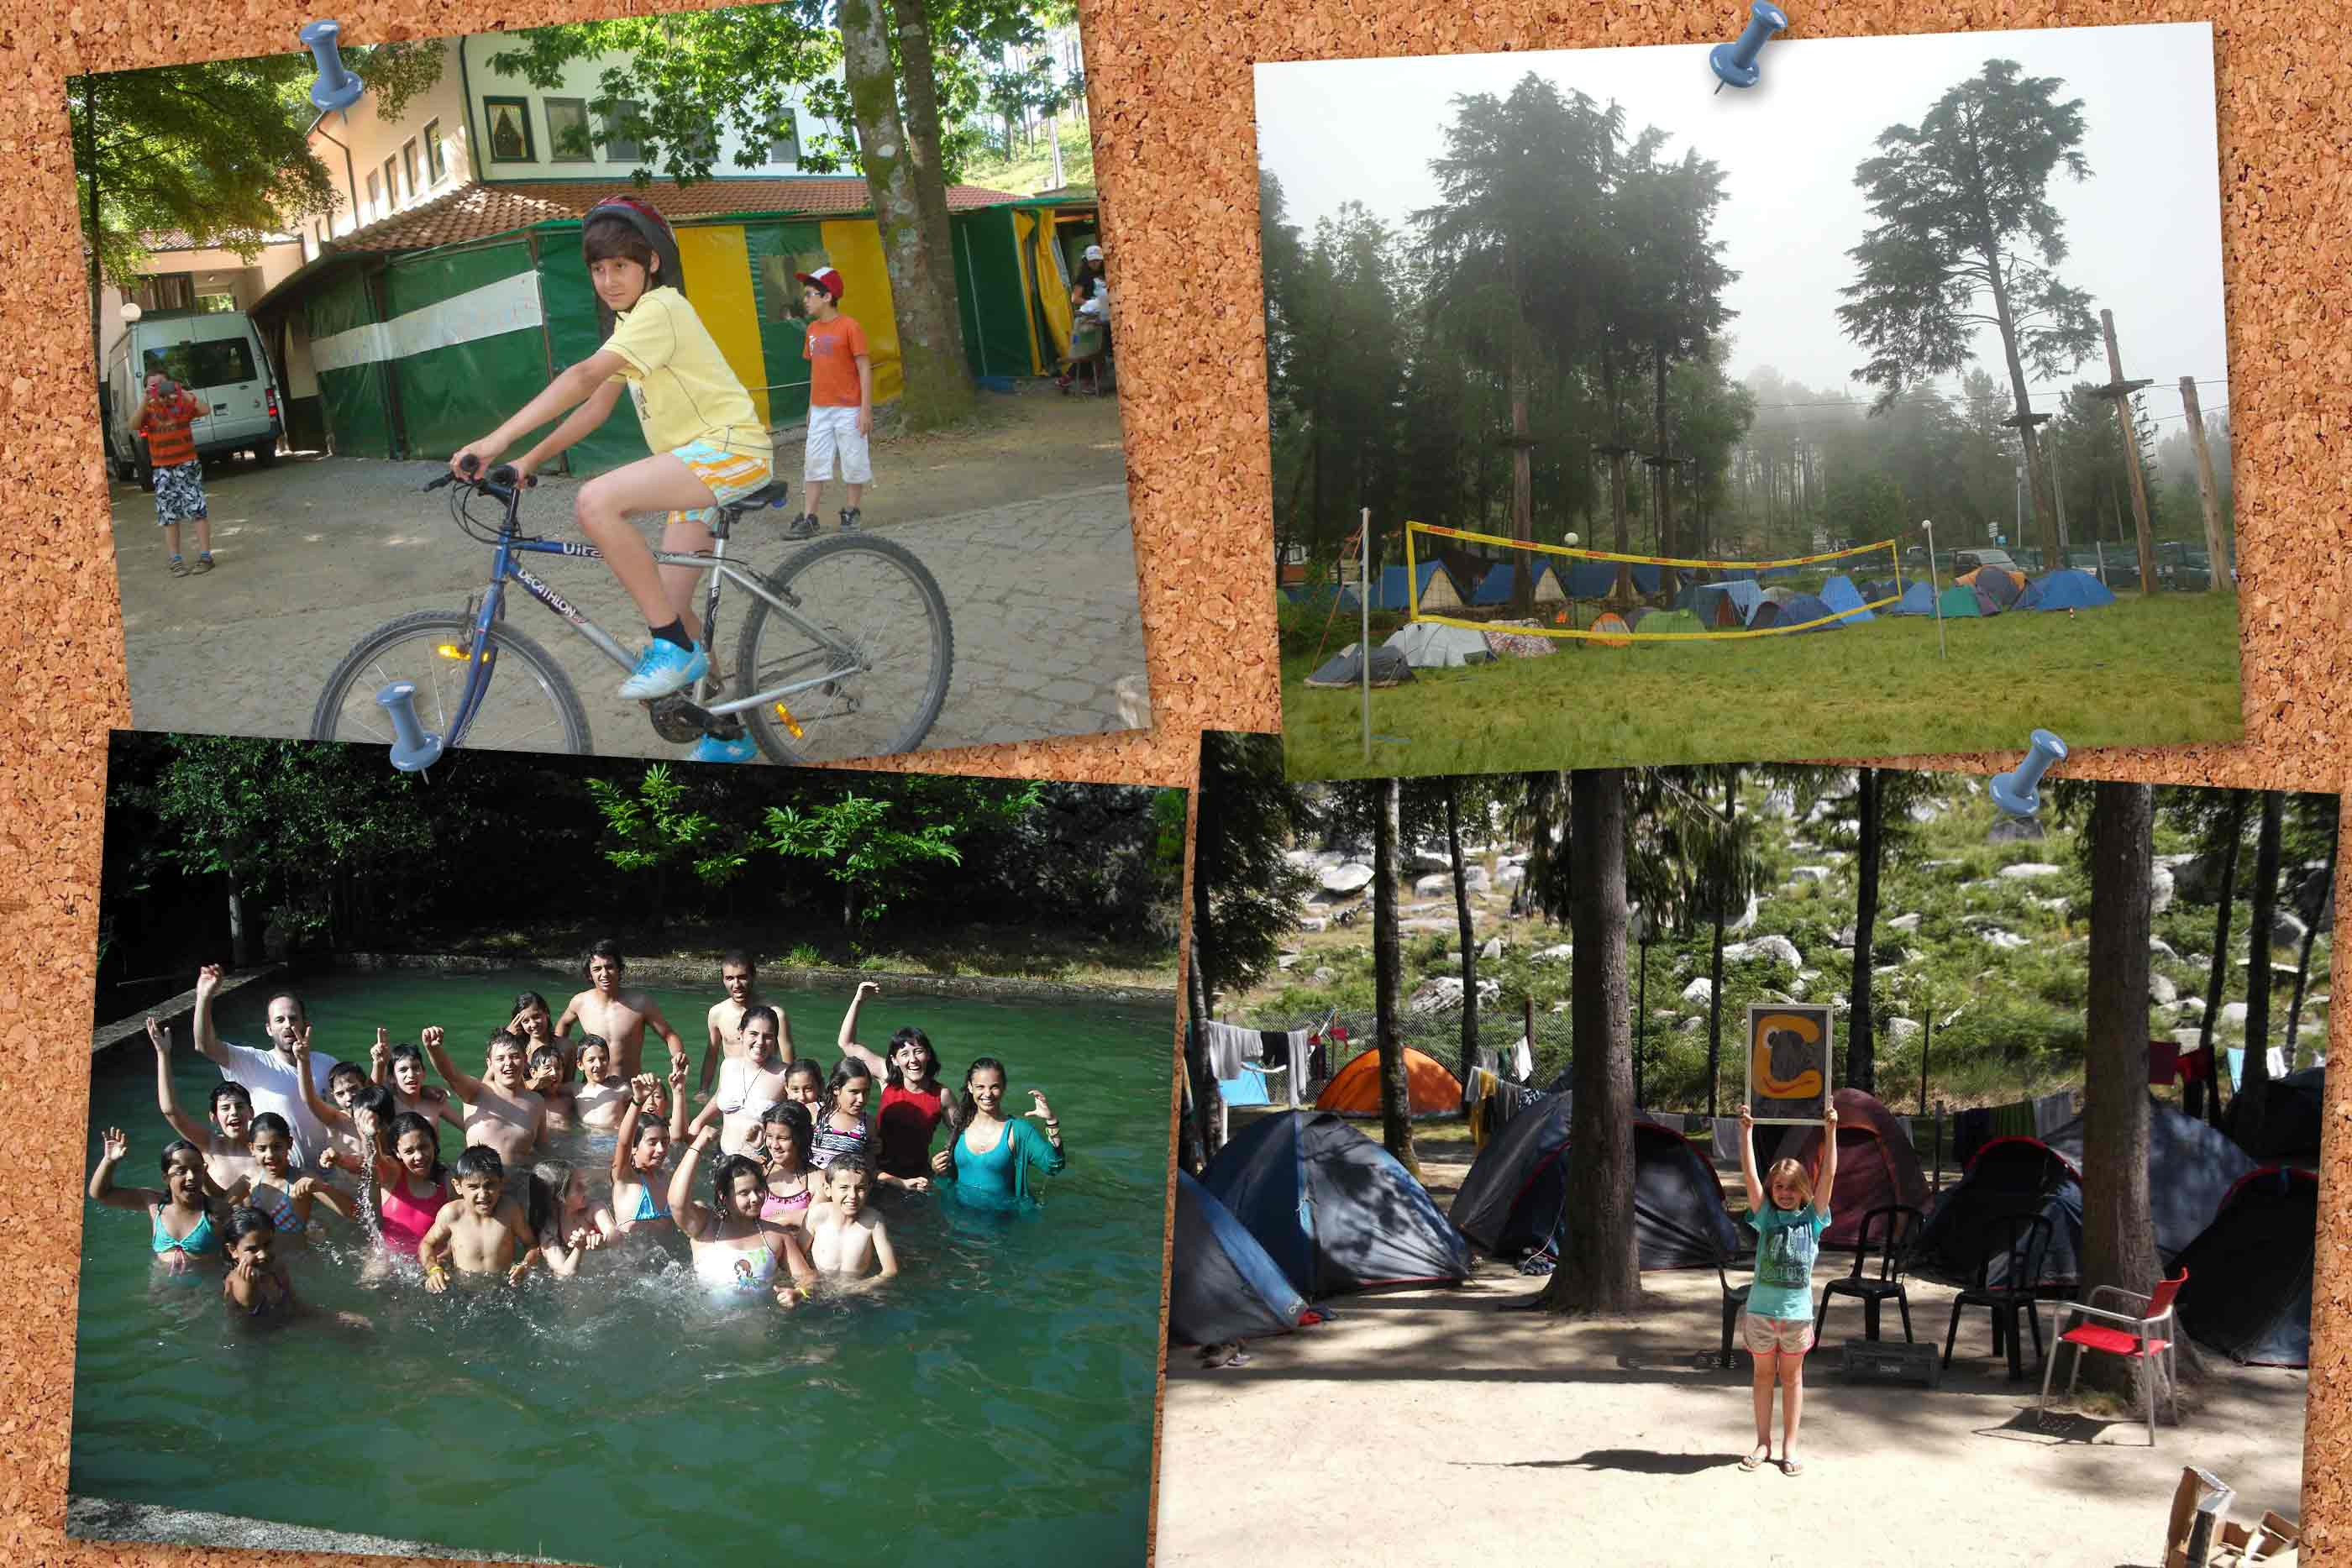 Actividades realizadas no exterior no Acampamento